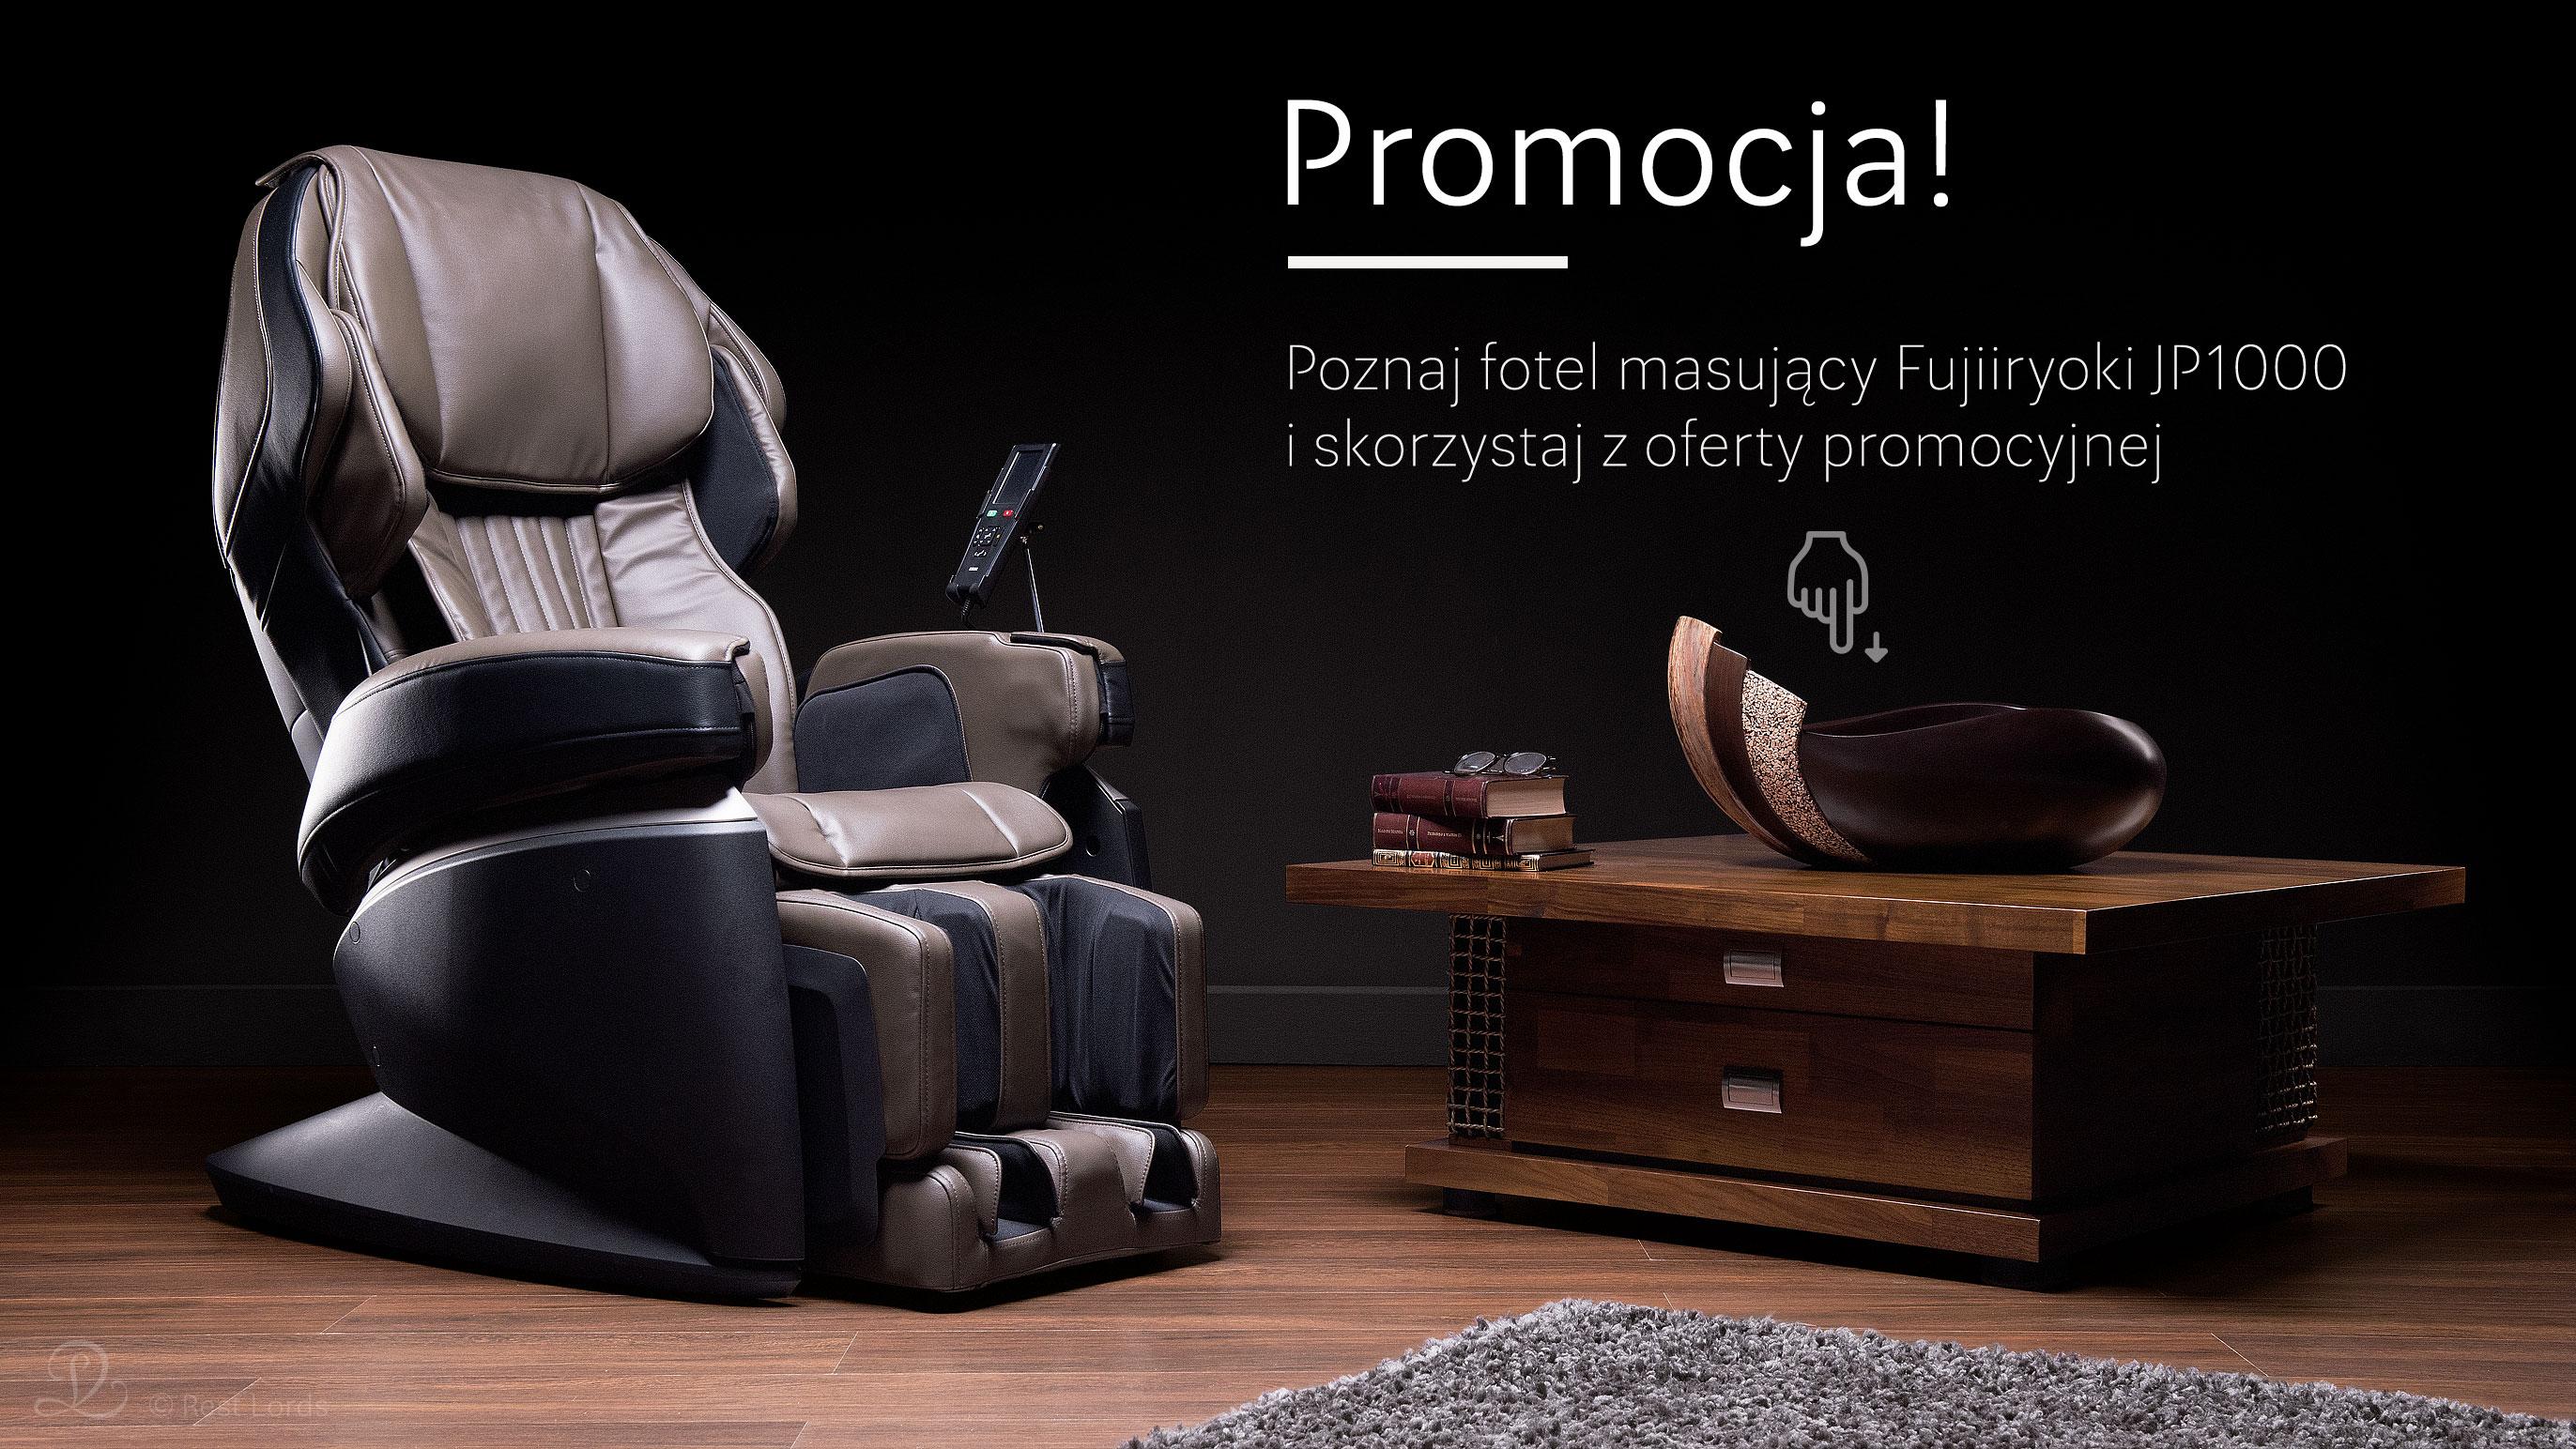 Promocja fotela FUjiiryoki JP1000